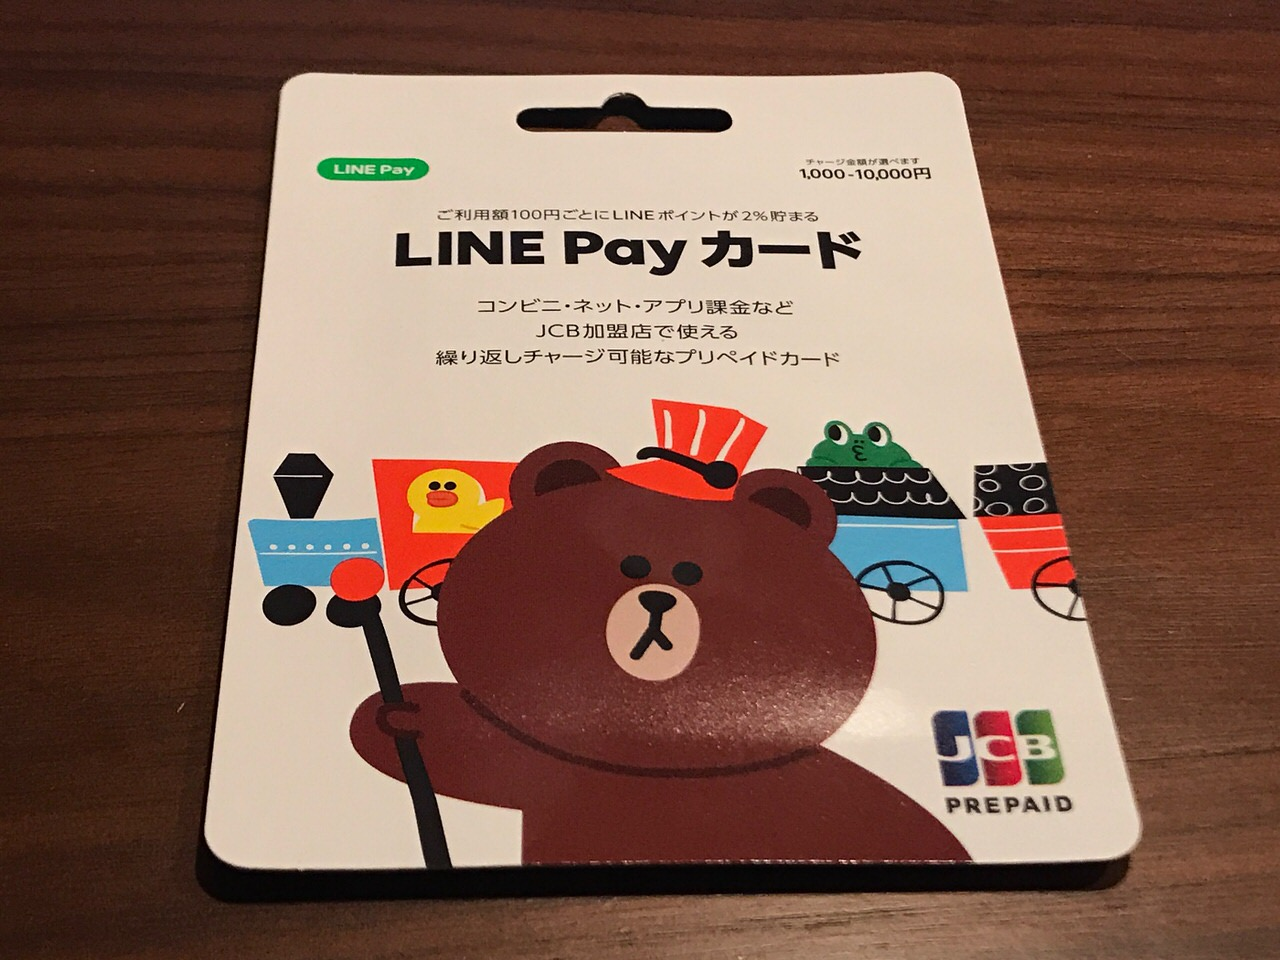 Line pay card 8722